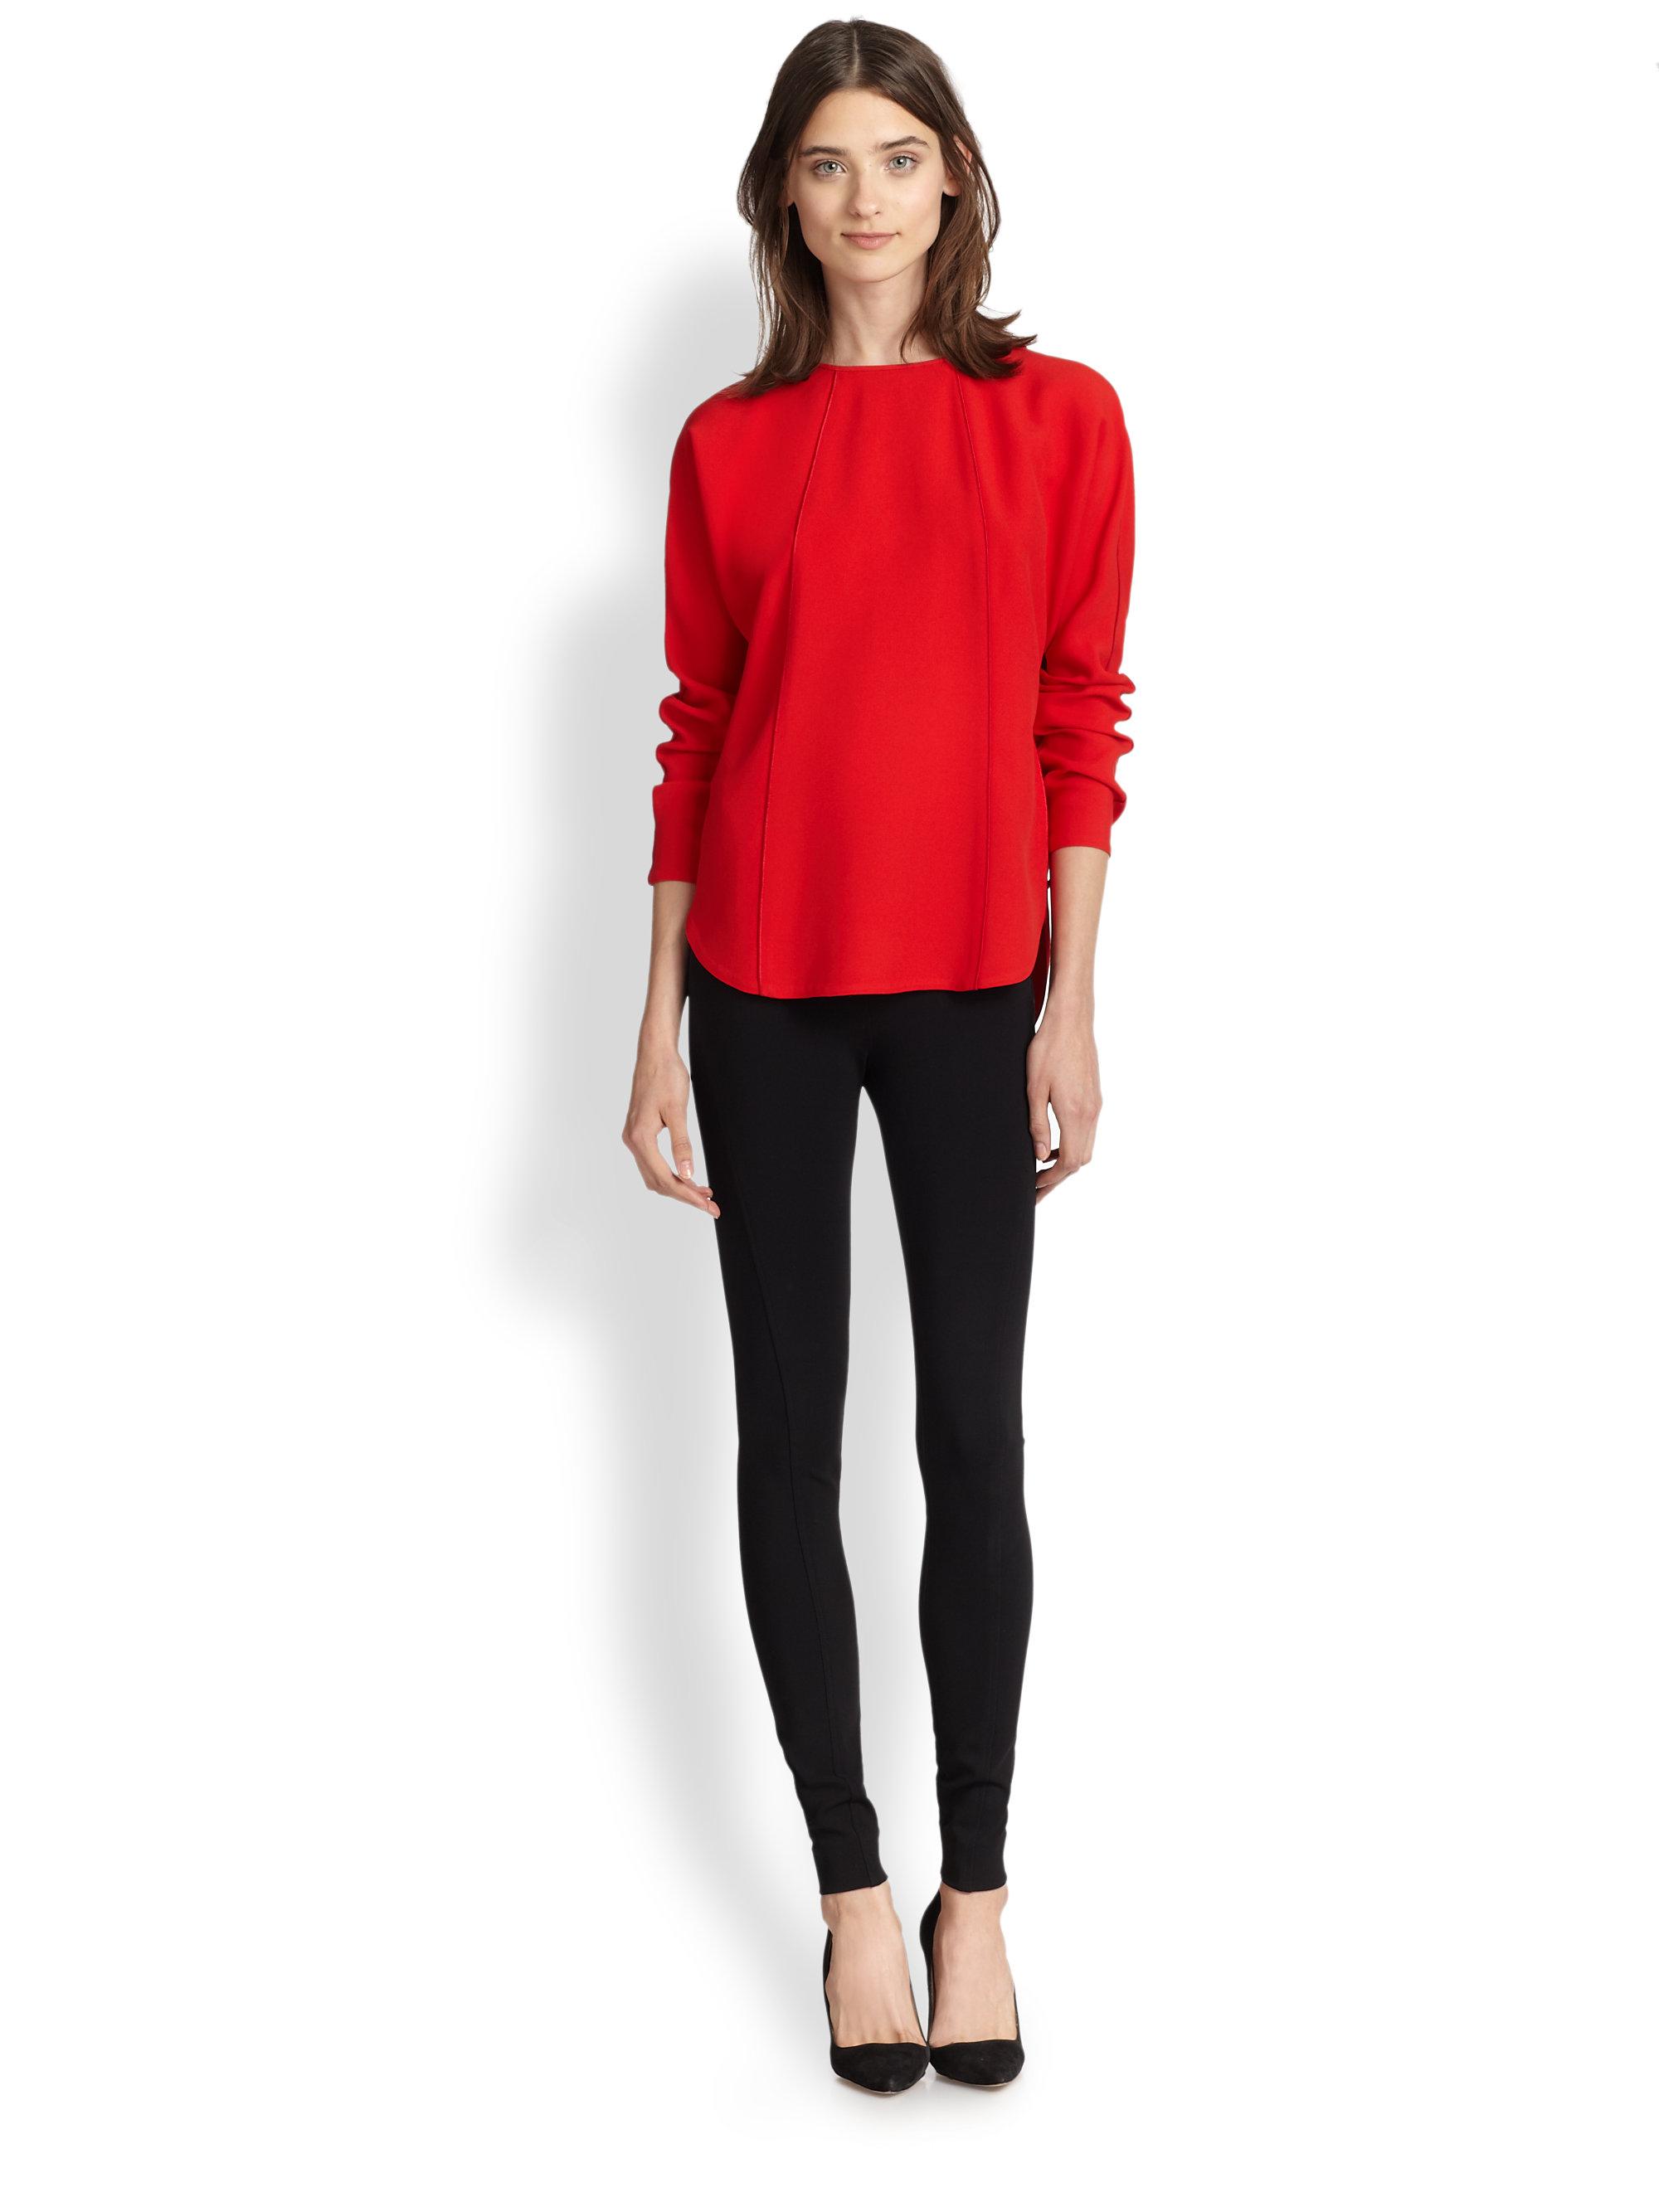 ralph lauren red blouse hot black blouse. Black Bedroom Furniture Sets. Home Design Ideas